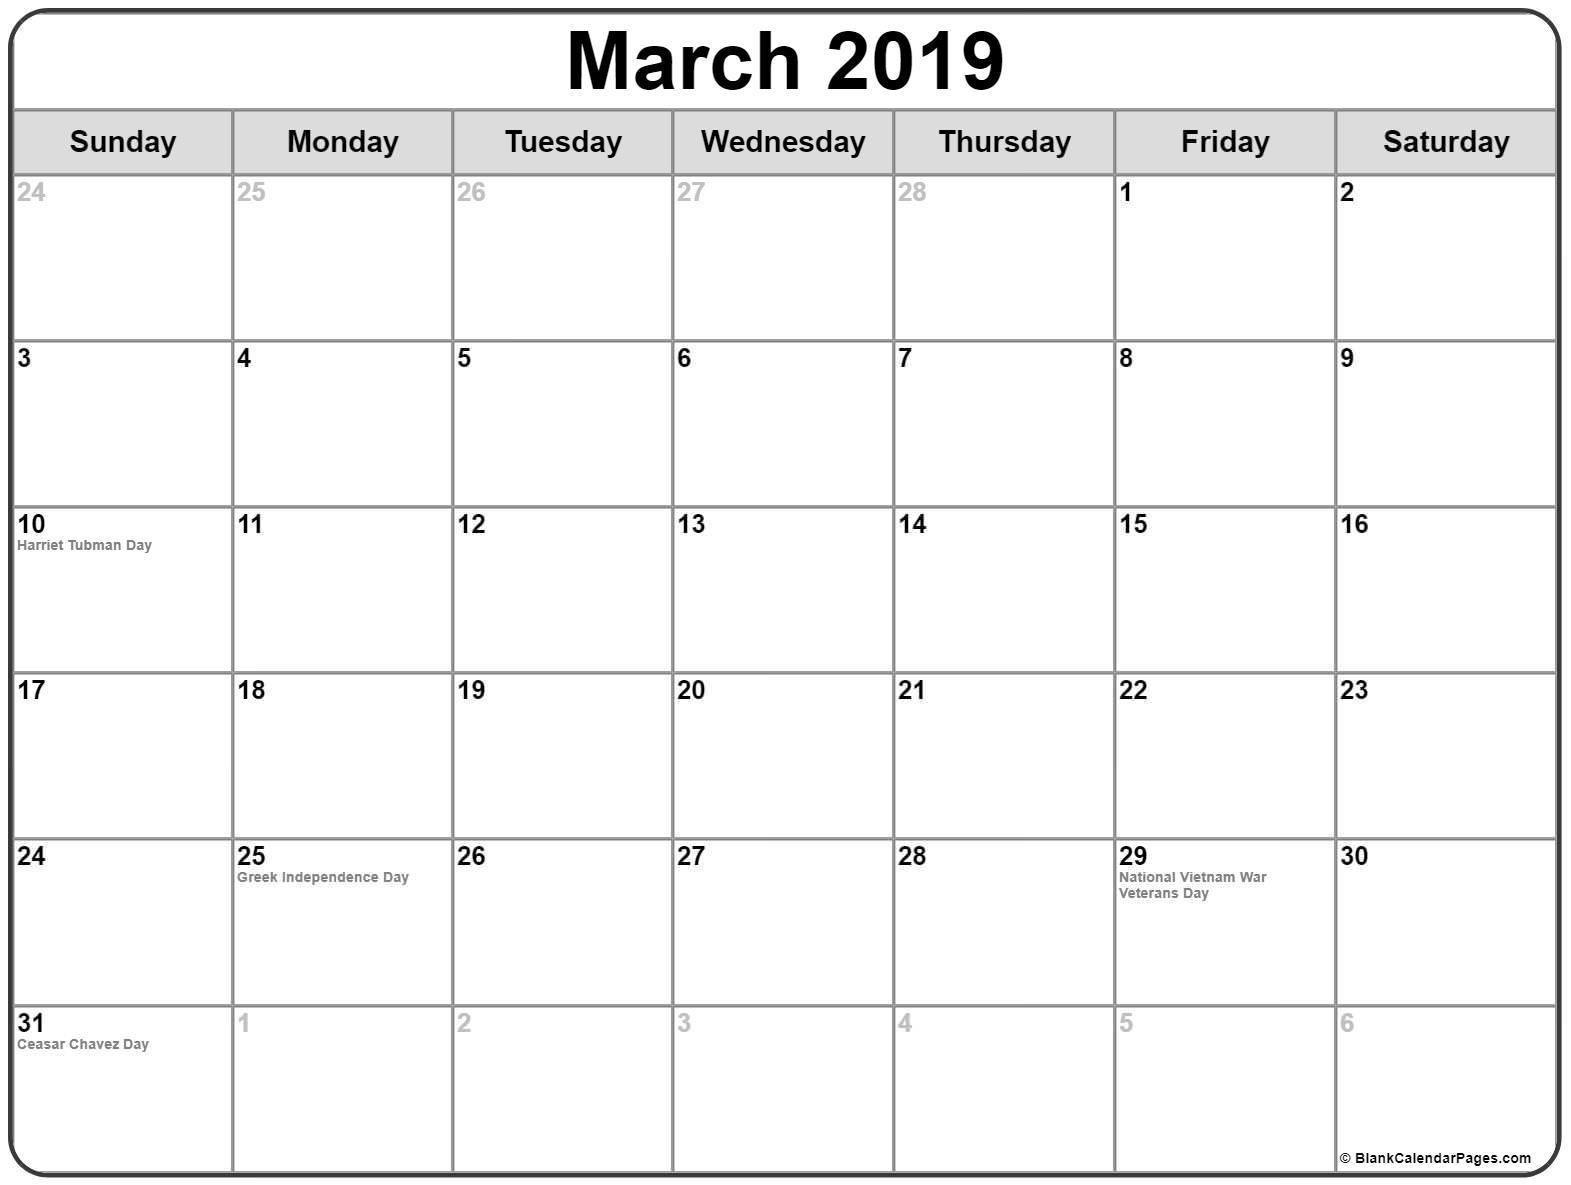 Federal Holidays Calendar March 2019 For USA